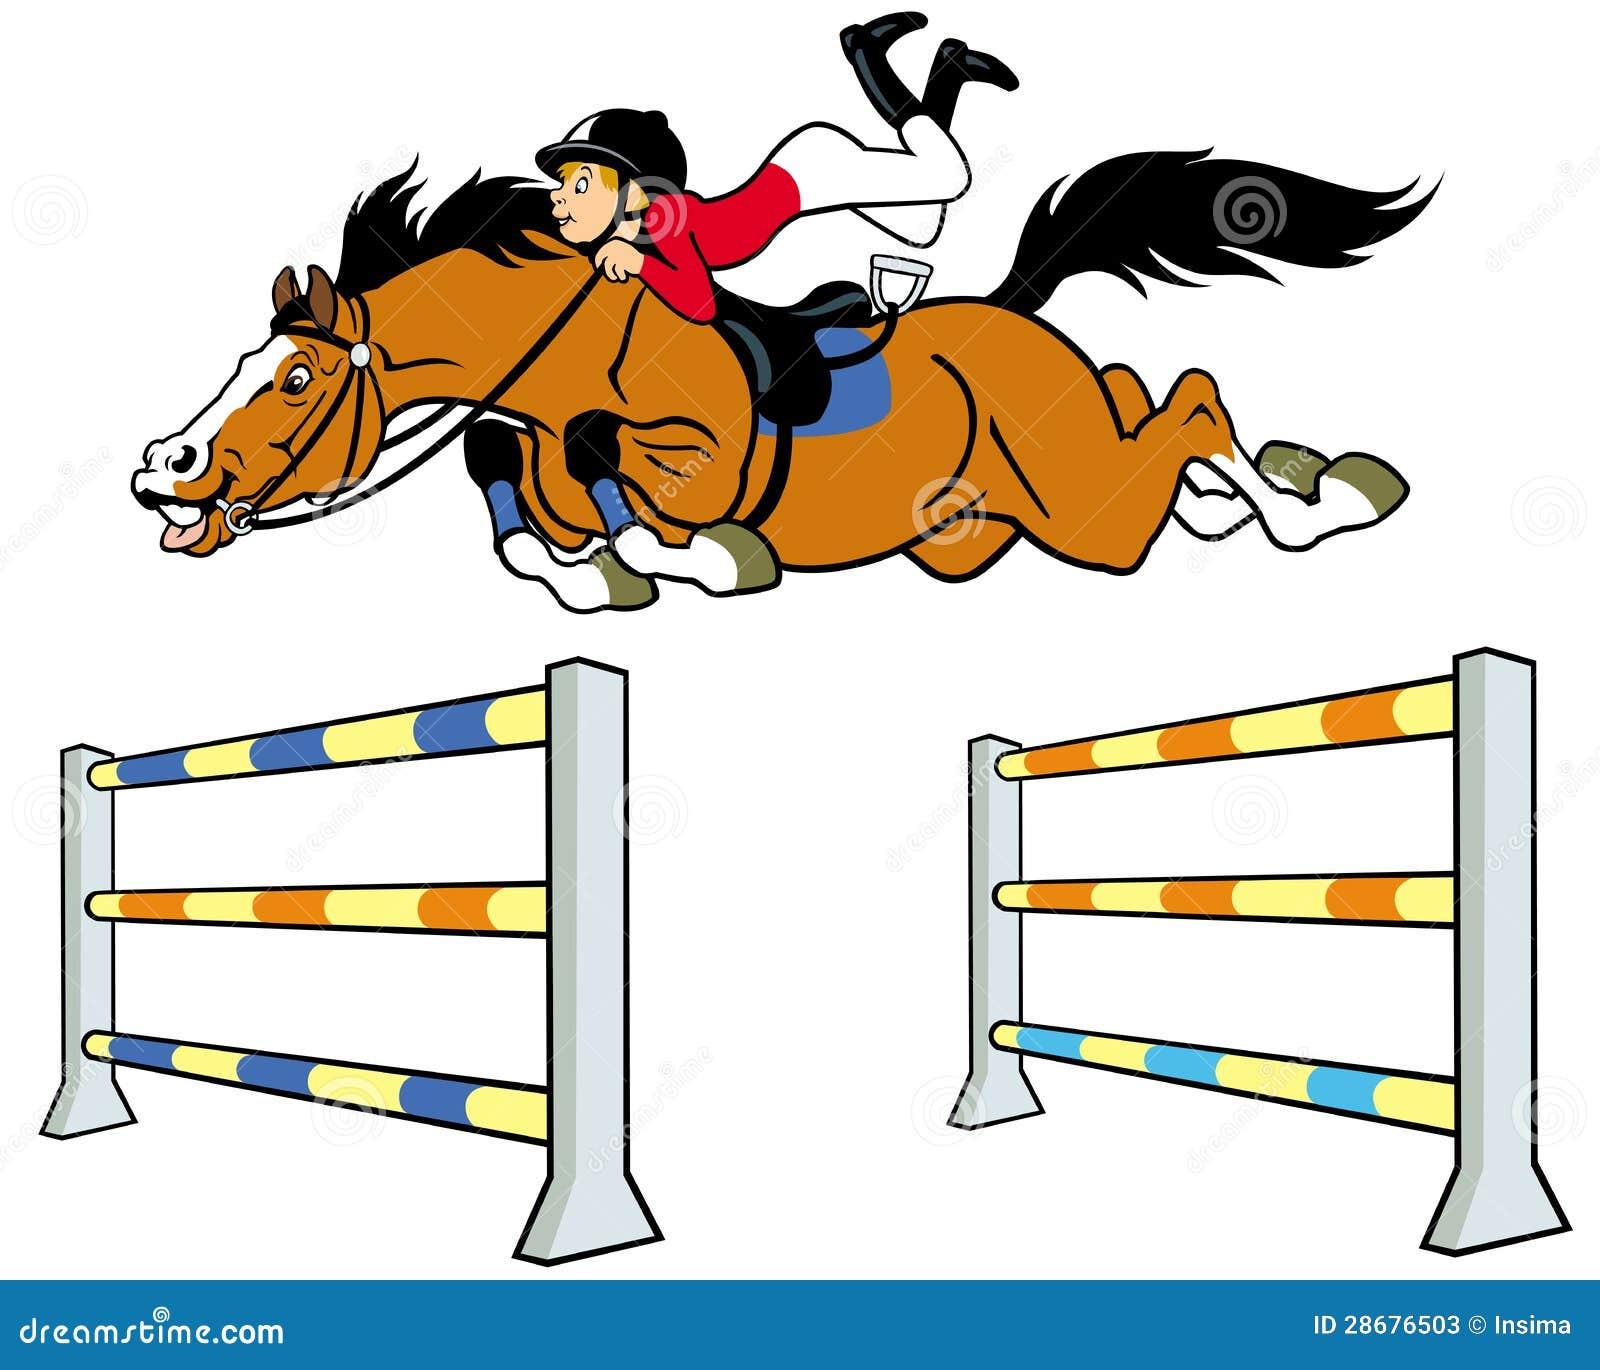 Horse riding images cartoon impremedia